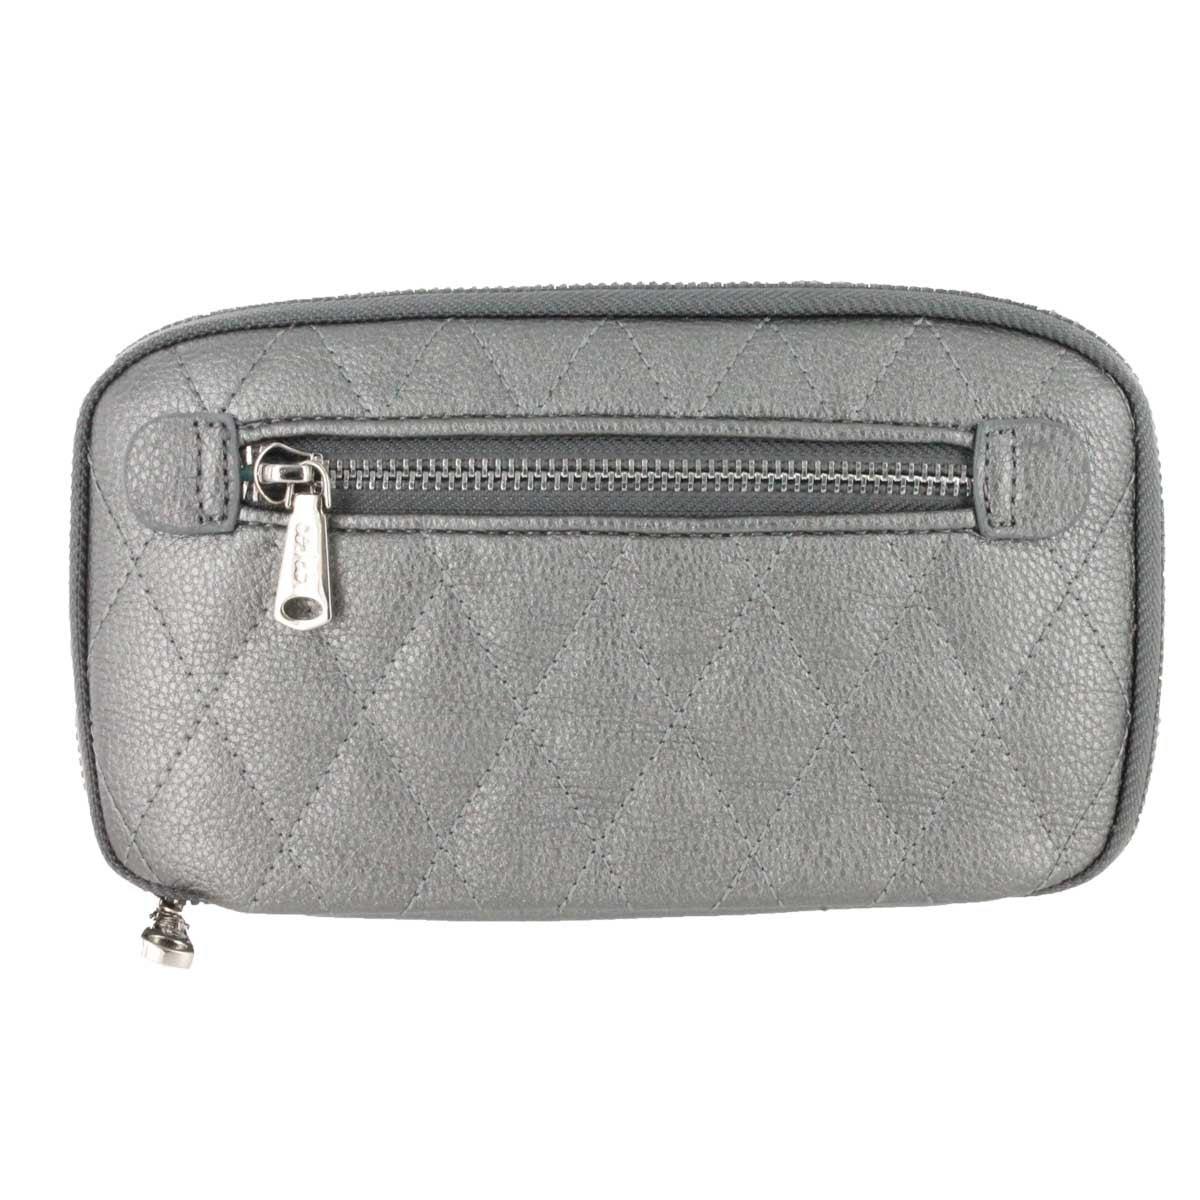 Zip Around pewter quilted wallet